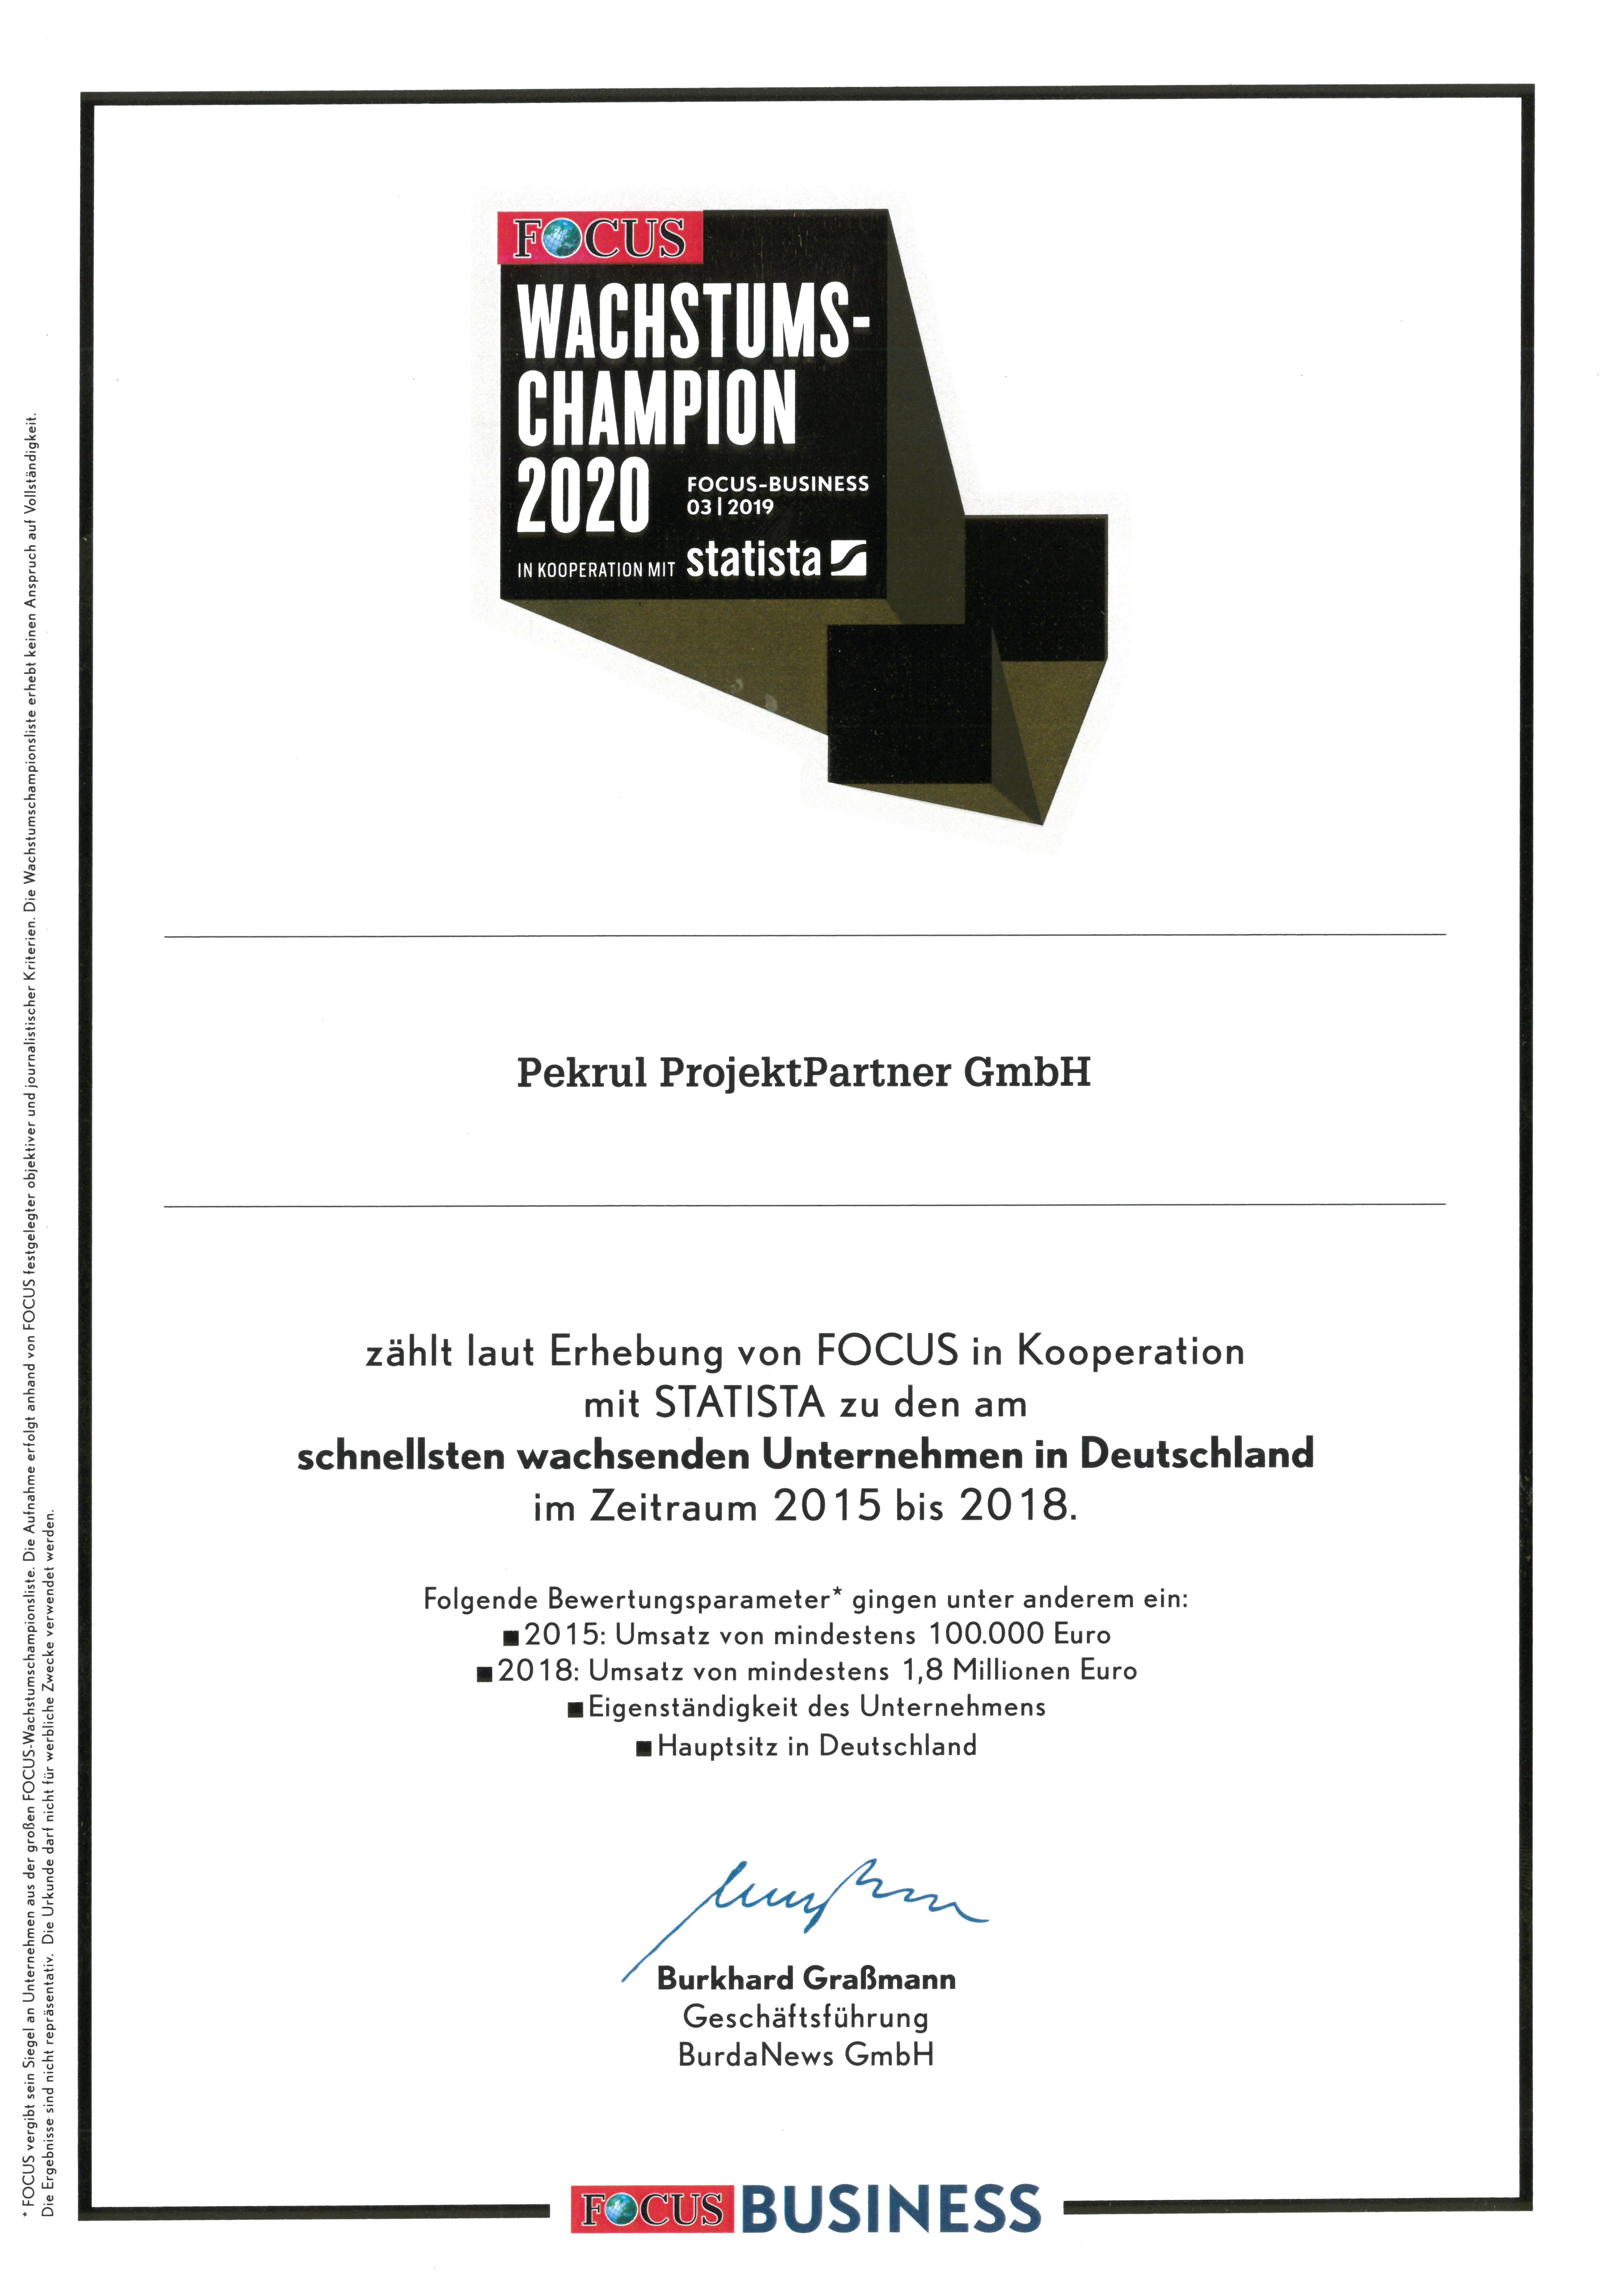 P3-FOCUS_Wachstumschampion-2020